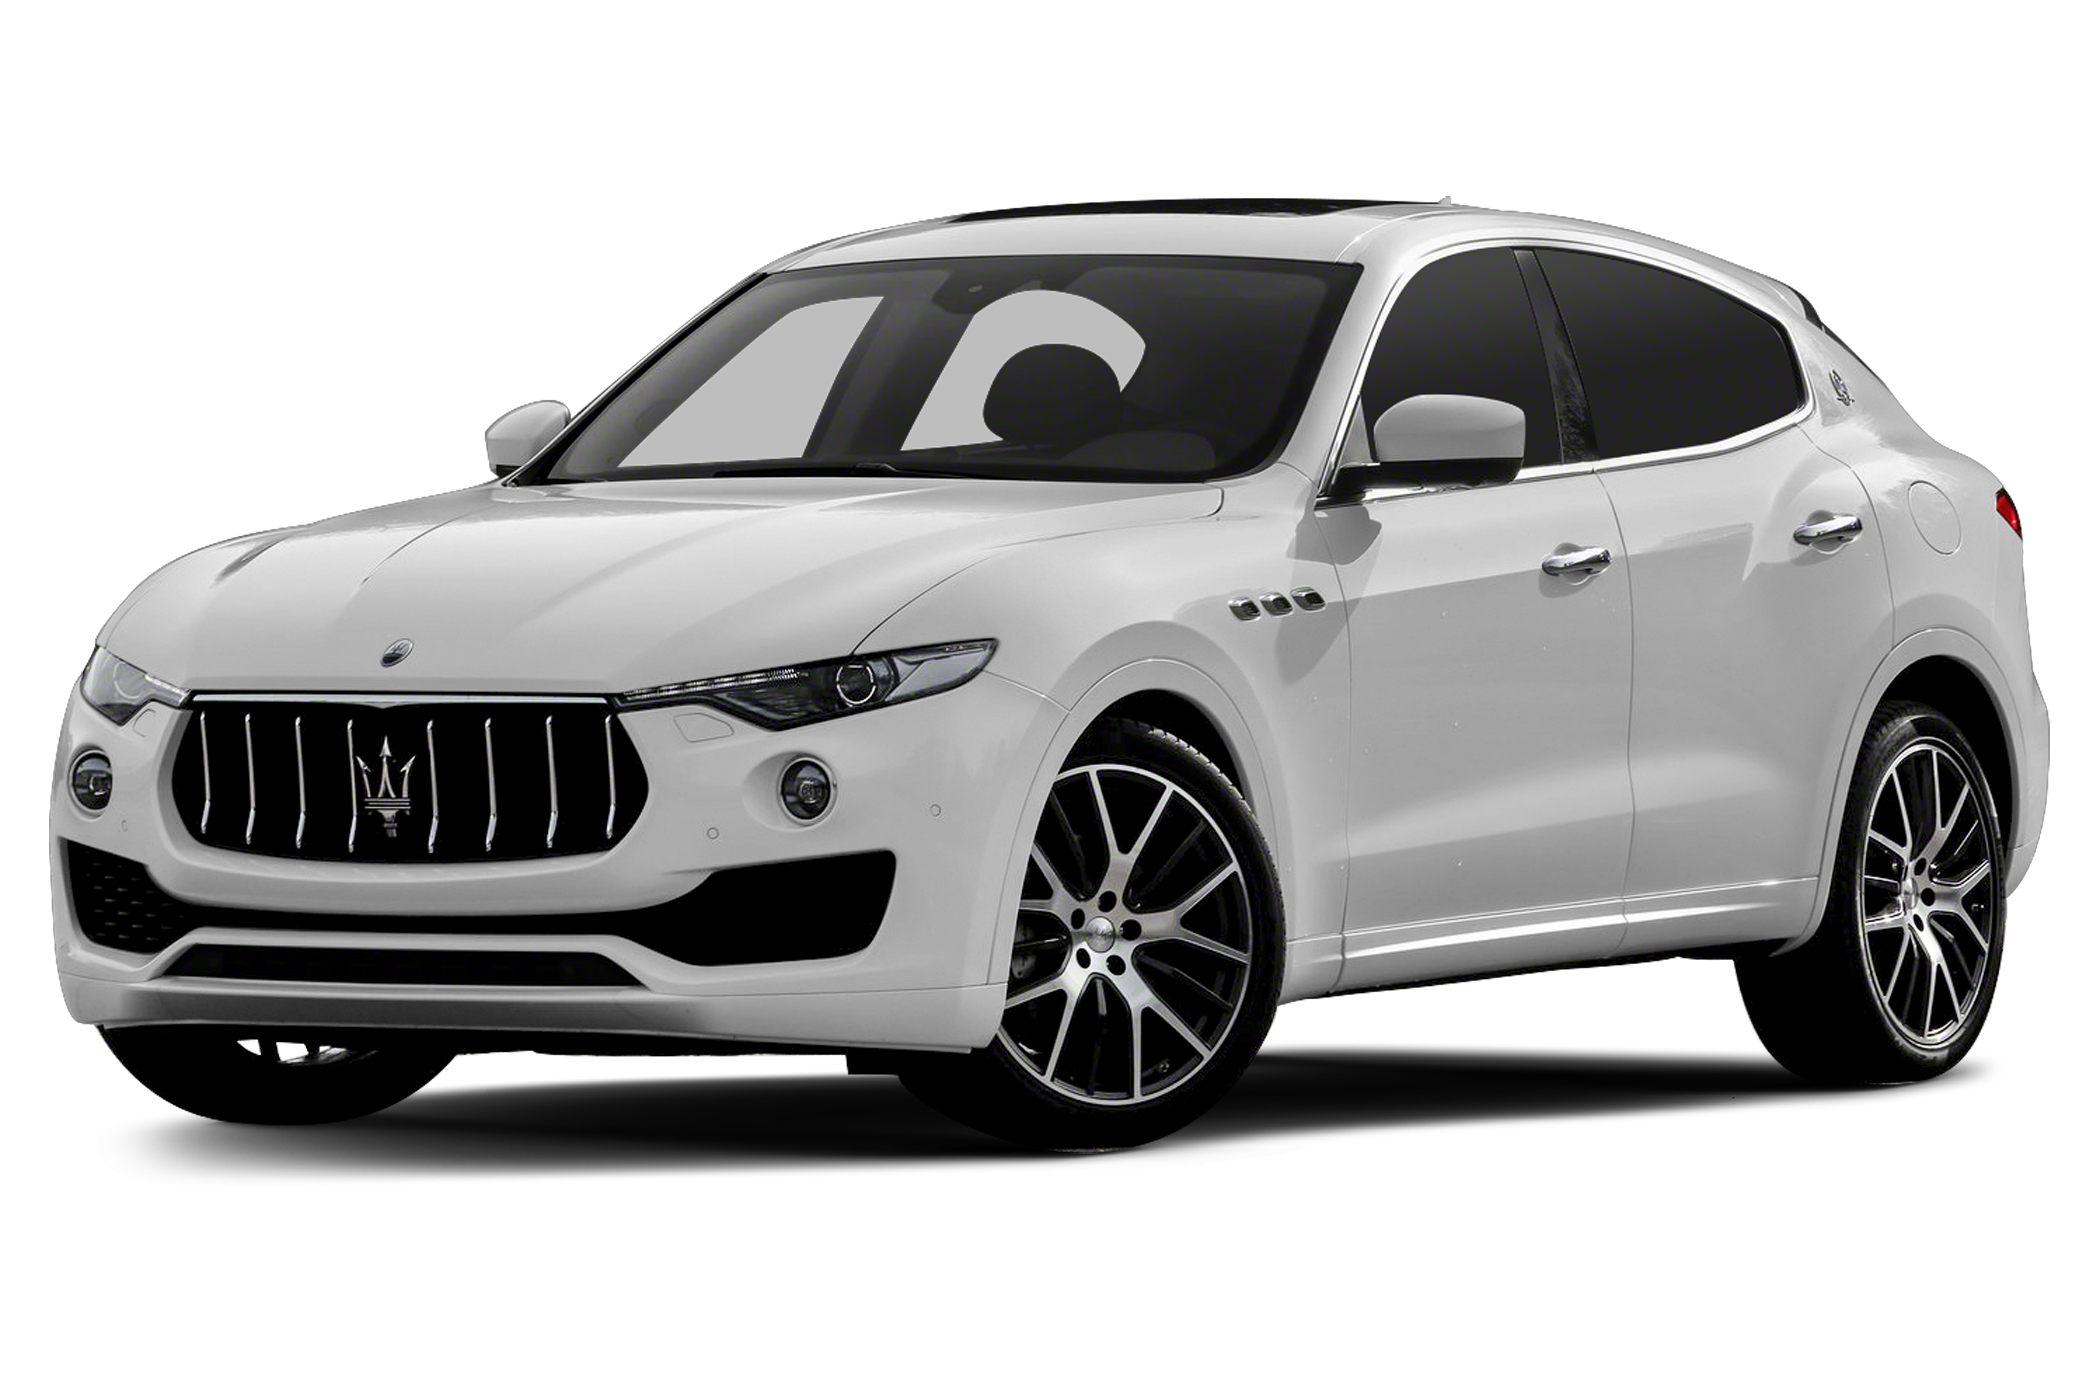 2017 Maserati Levante S All Wheel Drive Sport Utility Specs And Prices